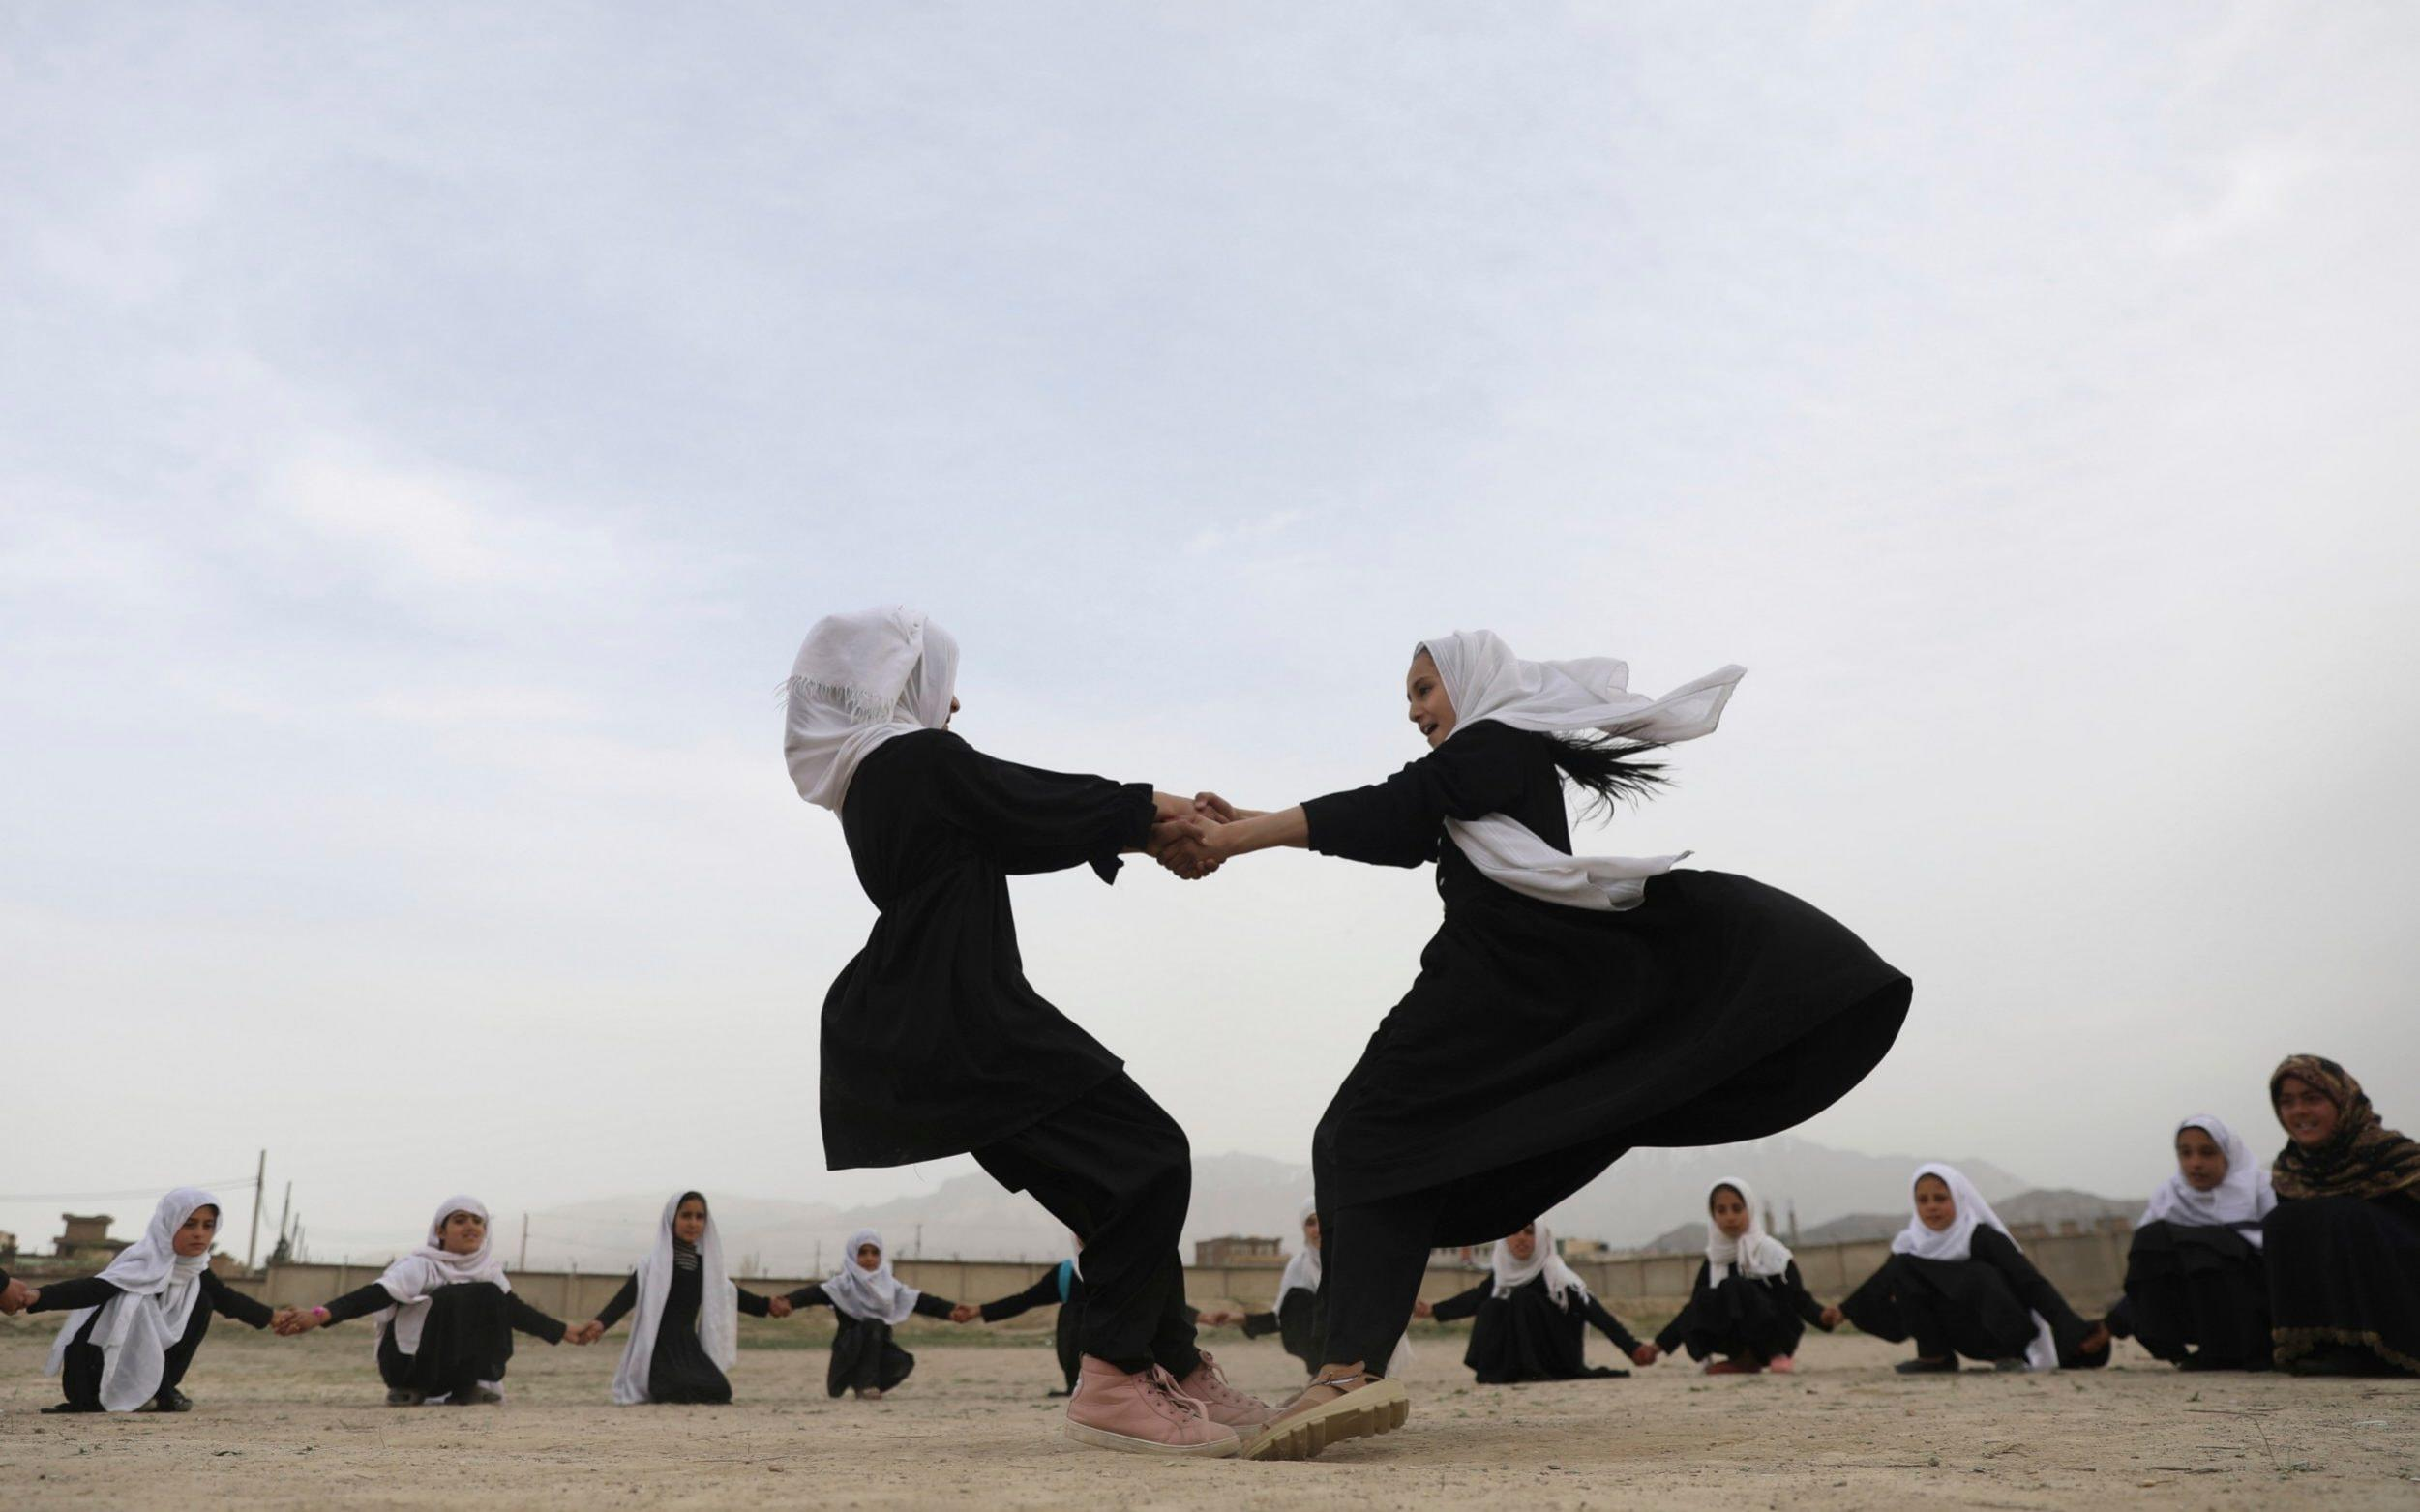 'It's equal to being dead': Women fear Taliban's return as US troop withdrawal nears